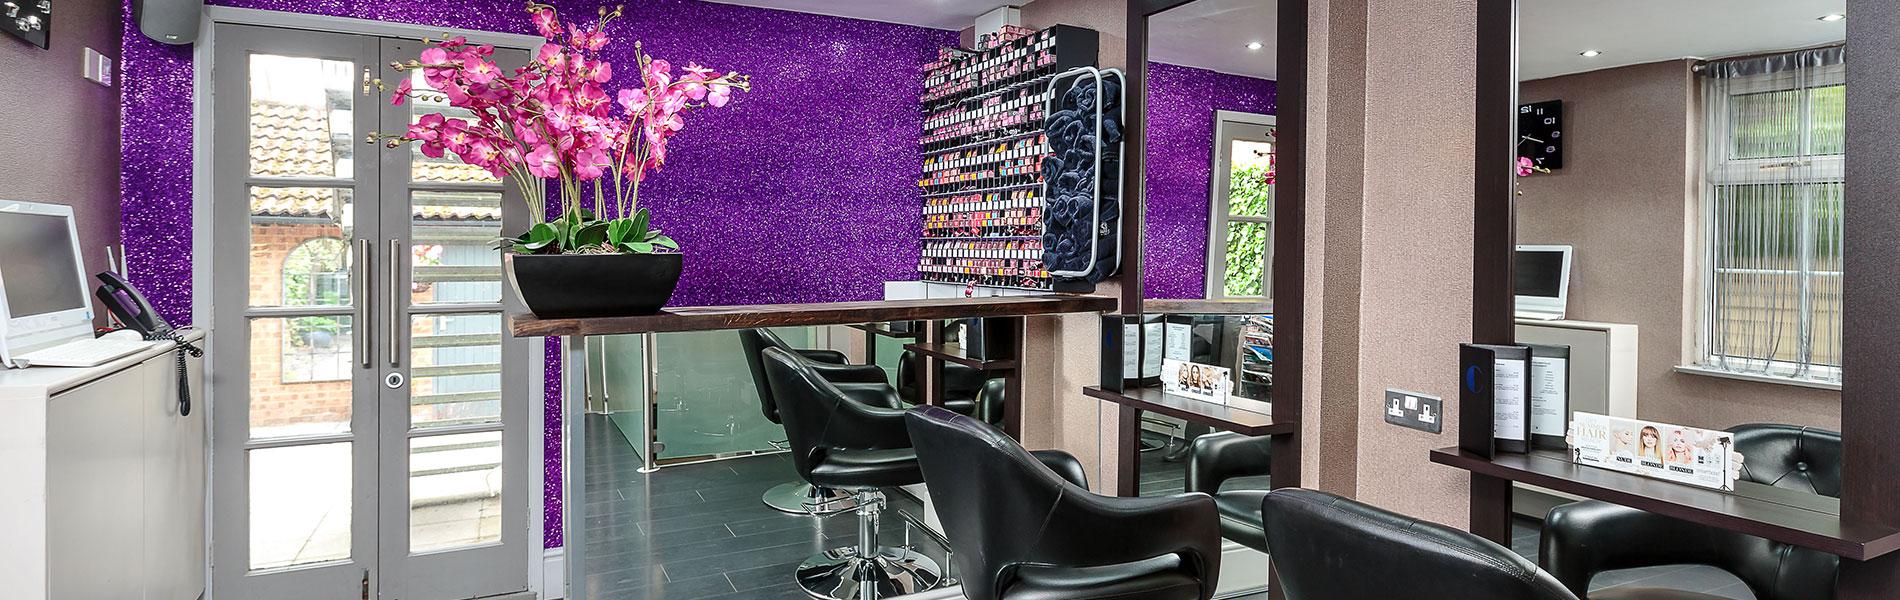 hair and beauty salon weybridge, Surrey